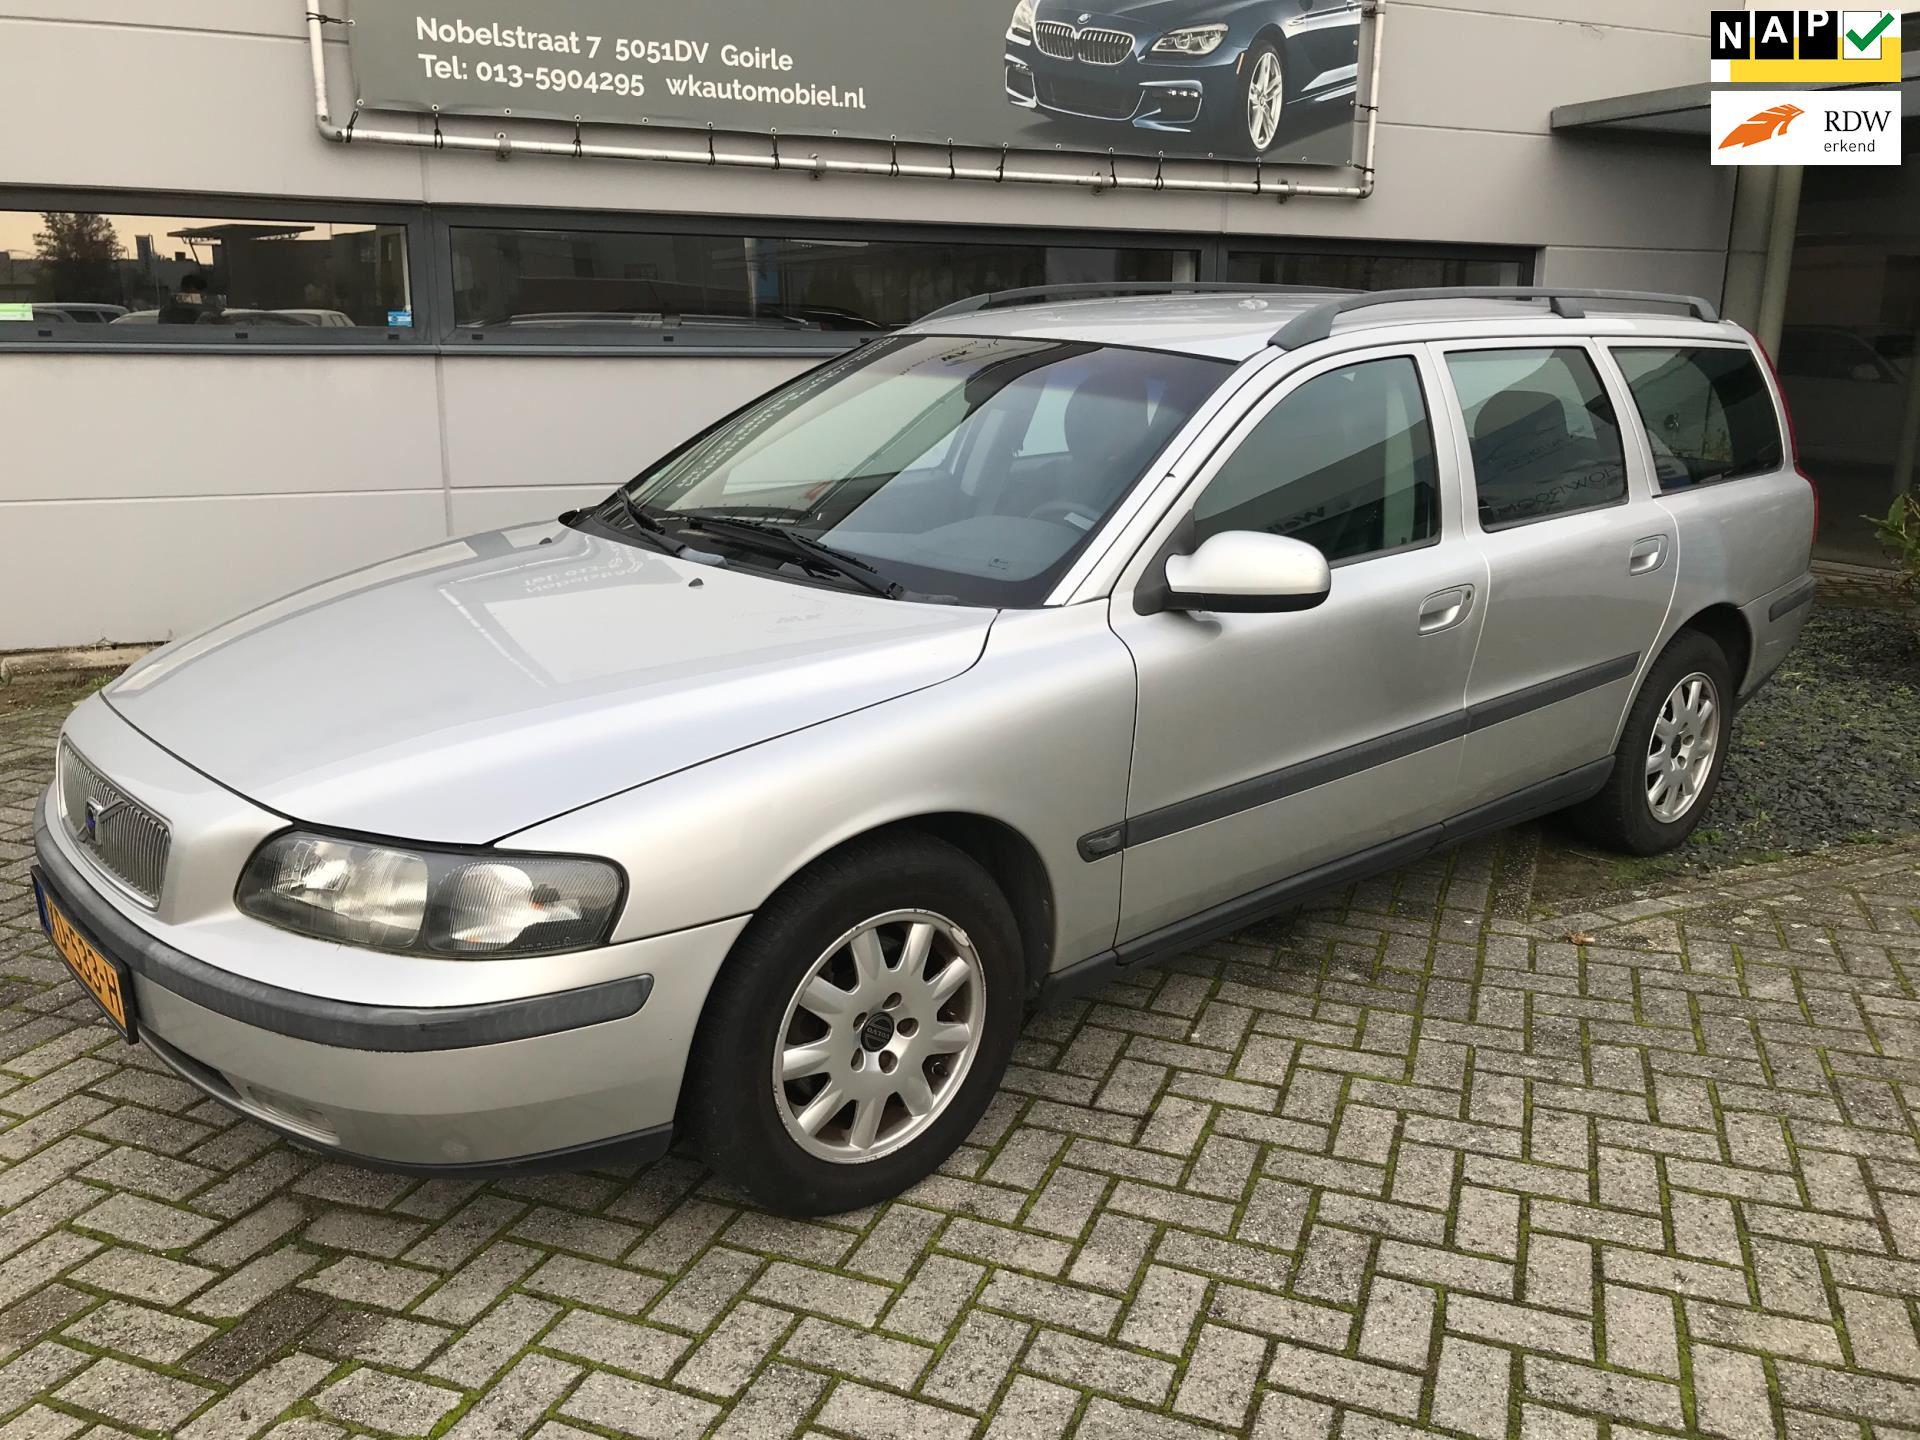 Volvo V70 occasion - WK Automobiel